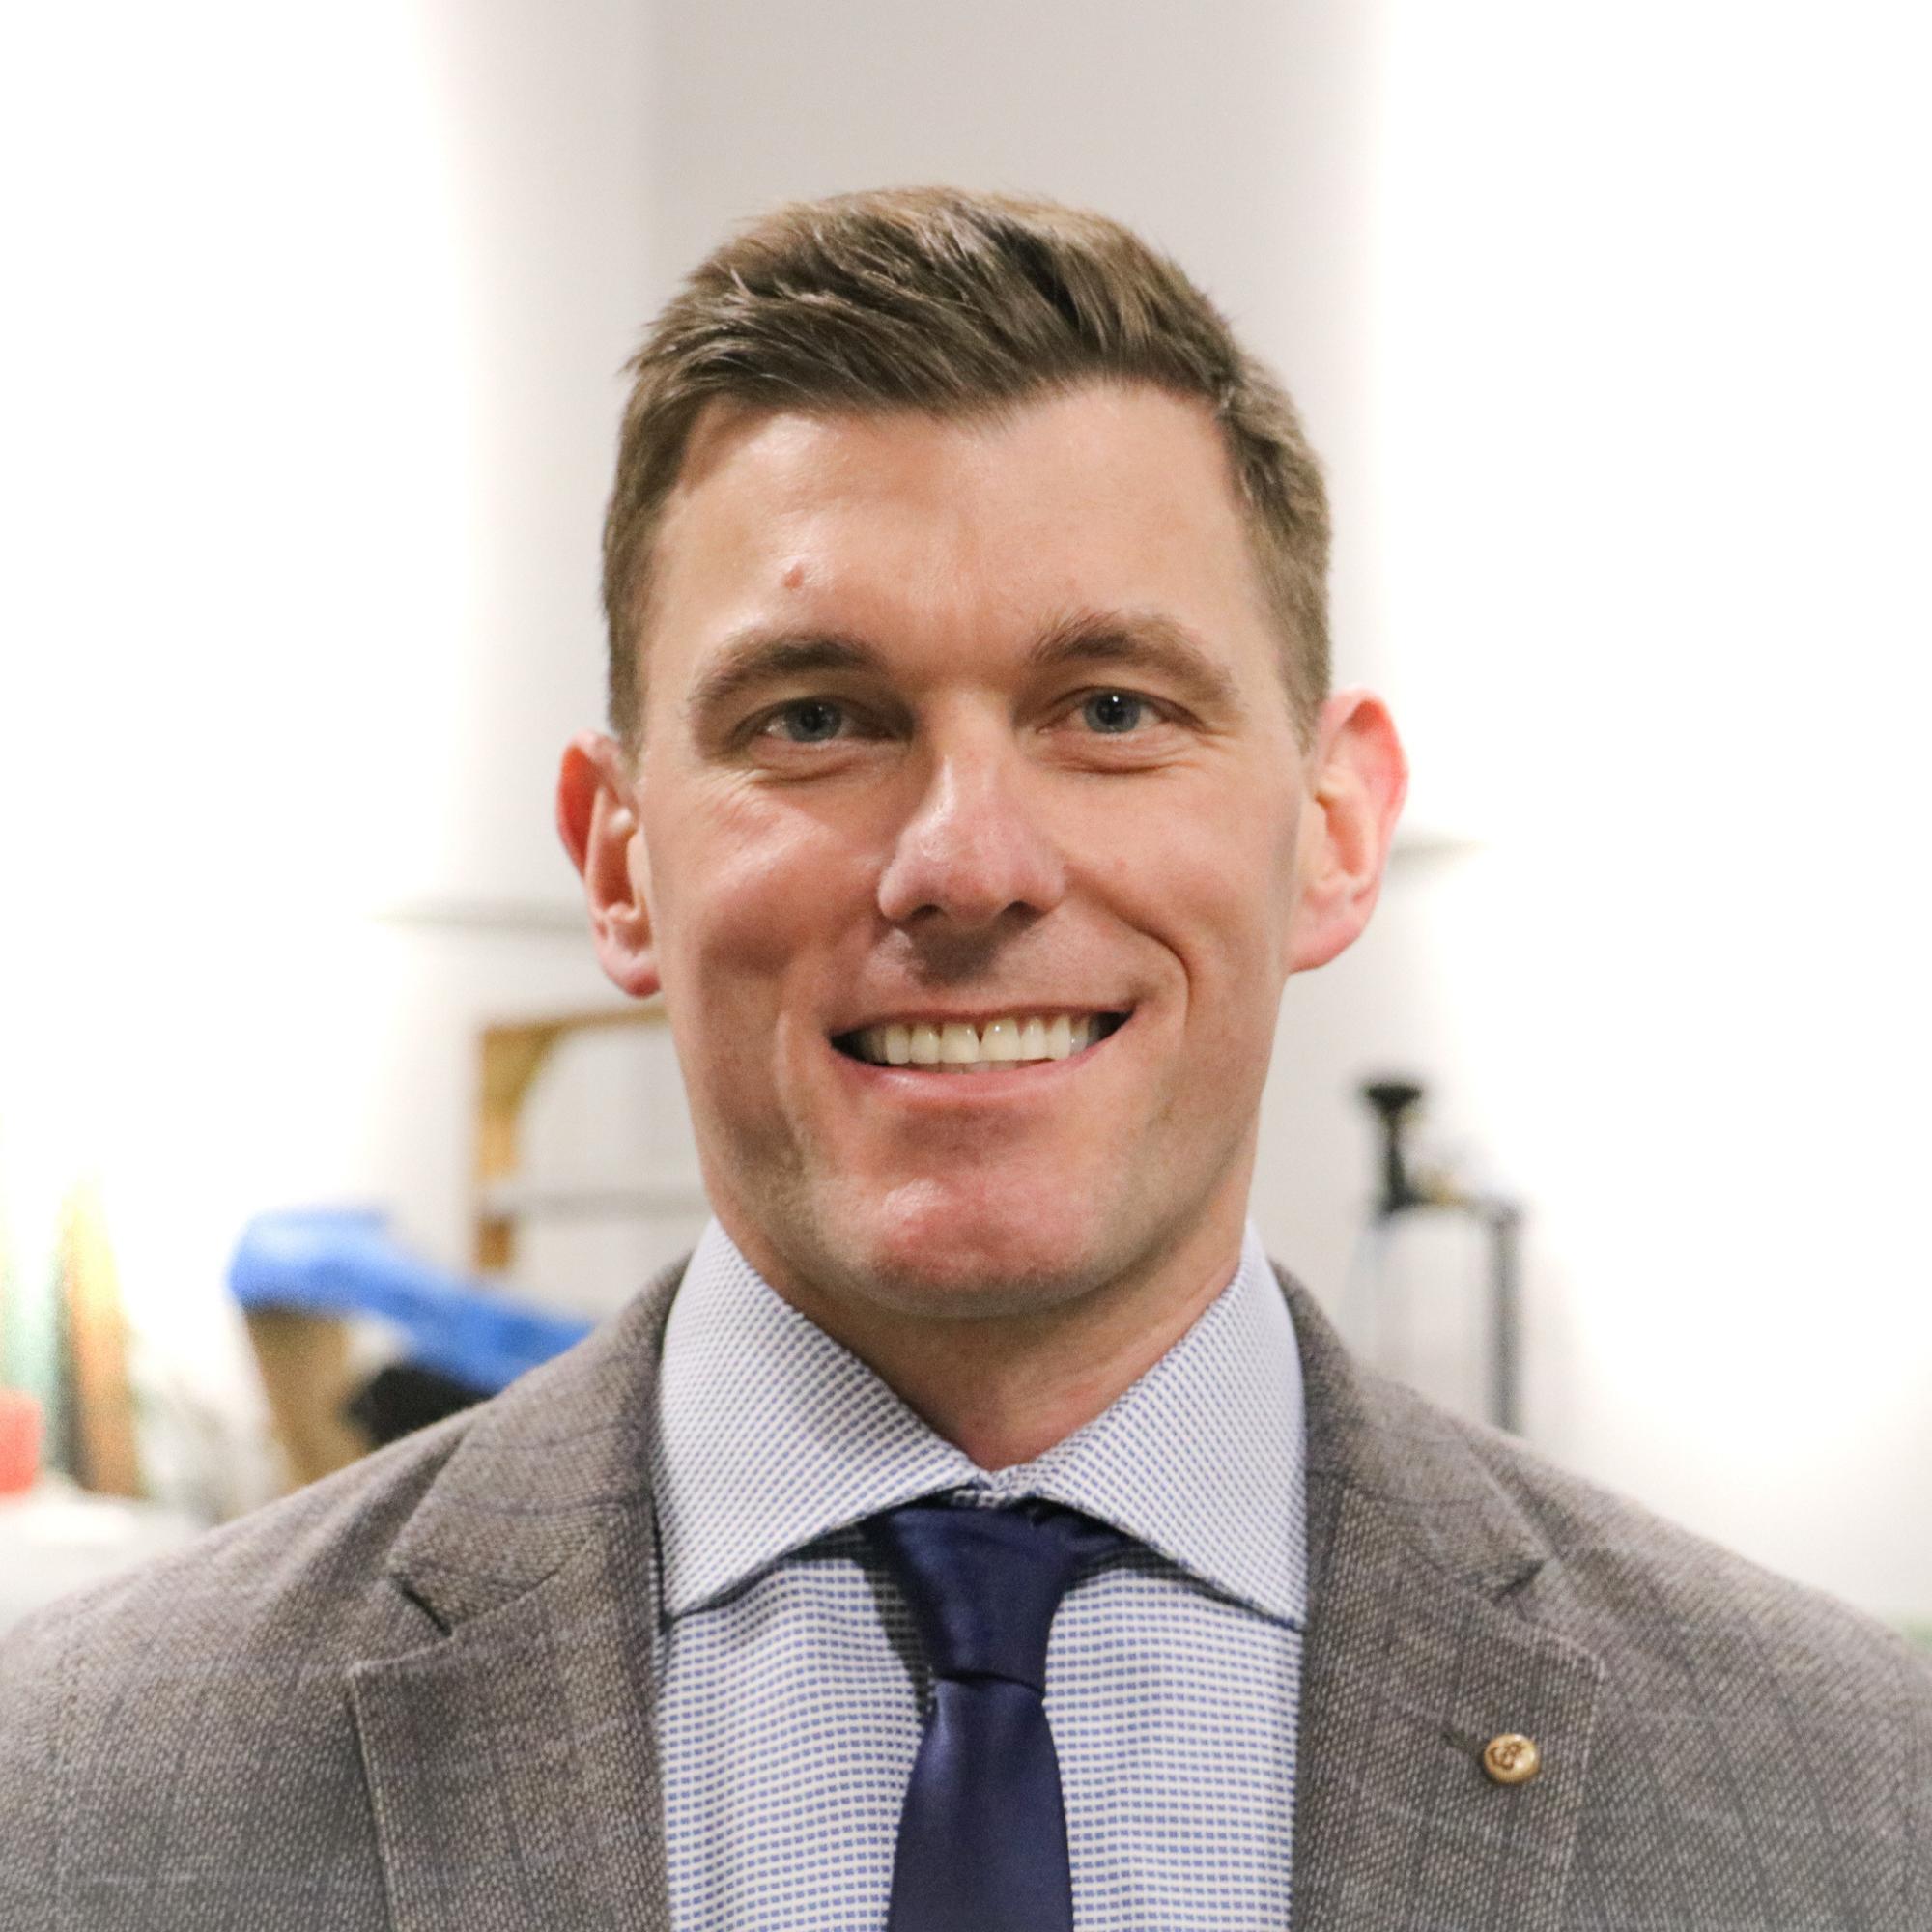 Jacob Randall - Director of Sales & Marketing